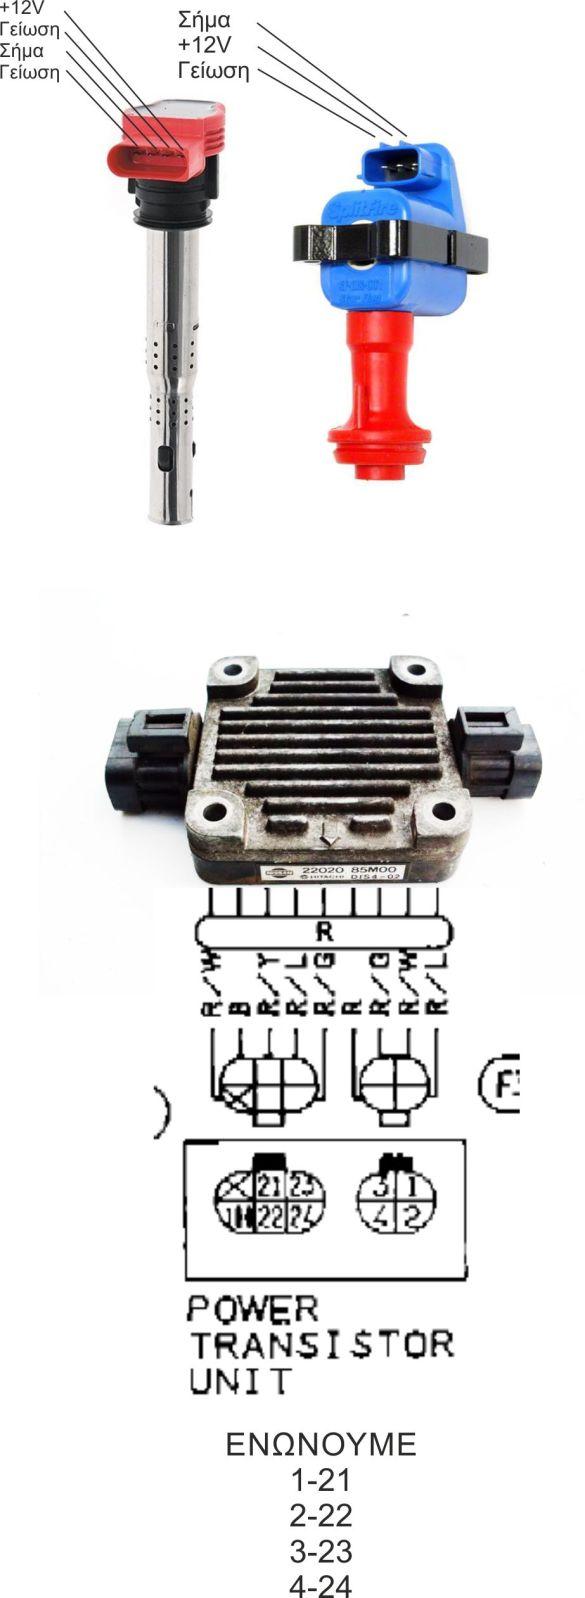 VAG coils στον CA18 4rss5x